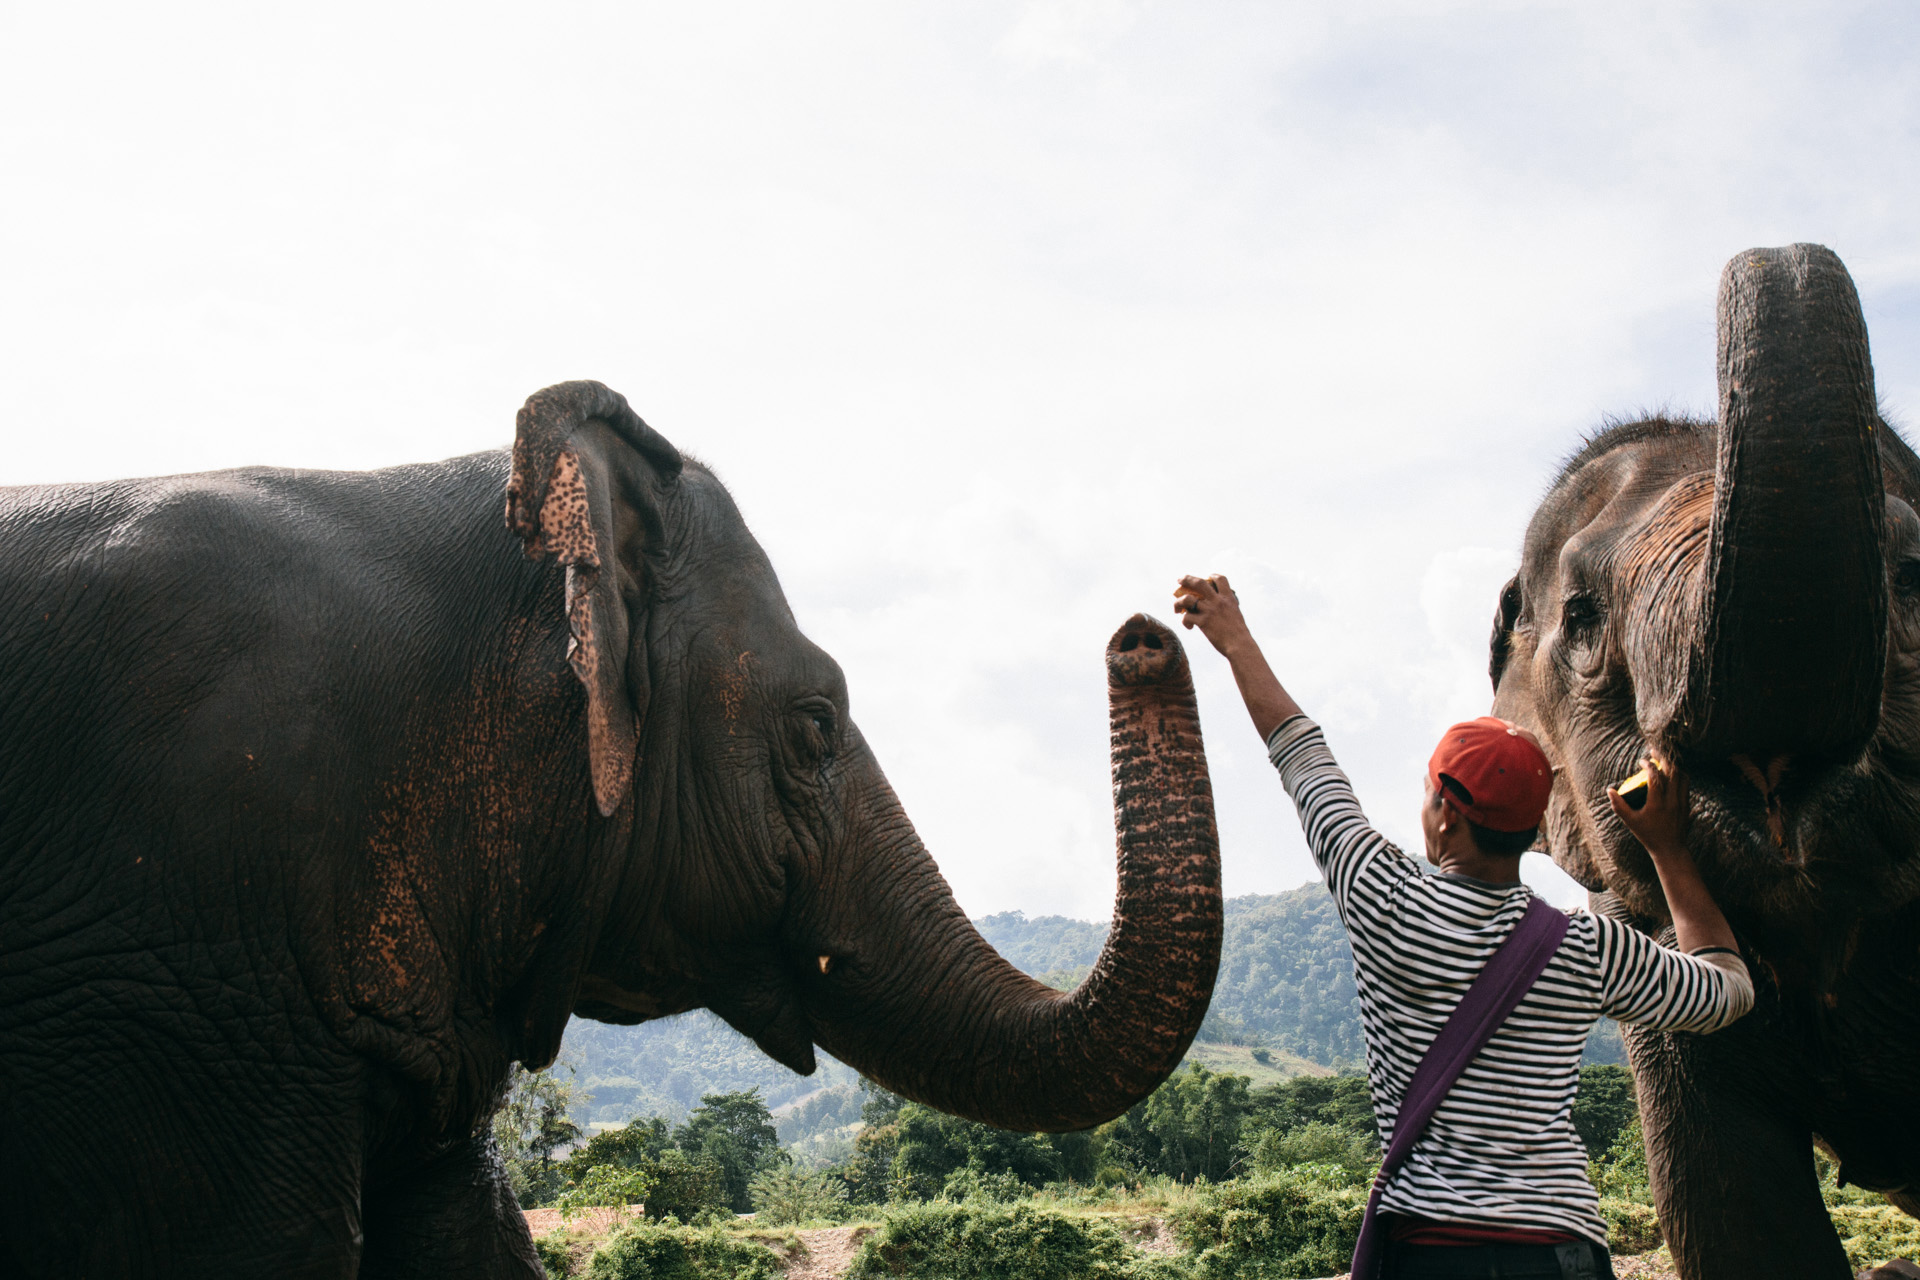 Ren Photography_Elephants_006.jpg